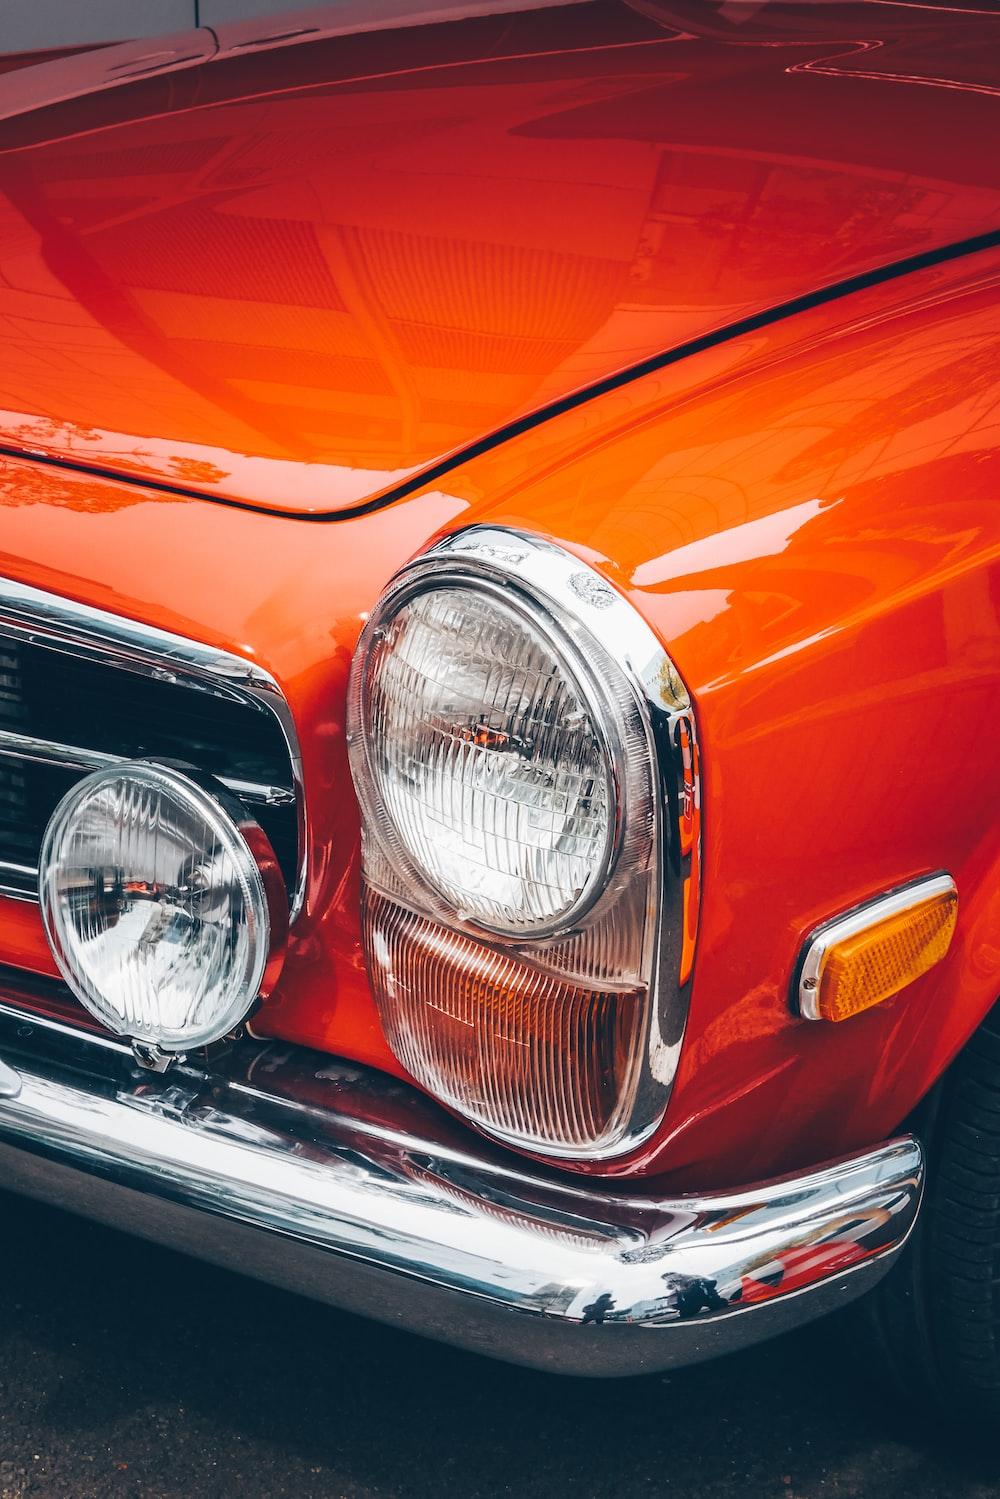 closeup view of orange vehicle